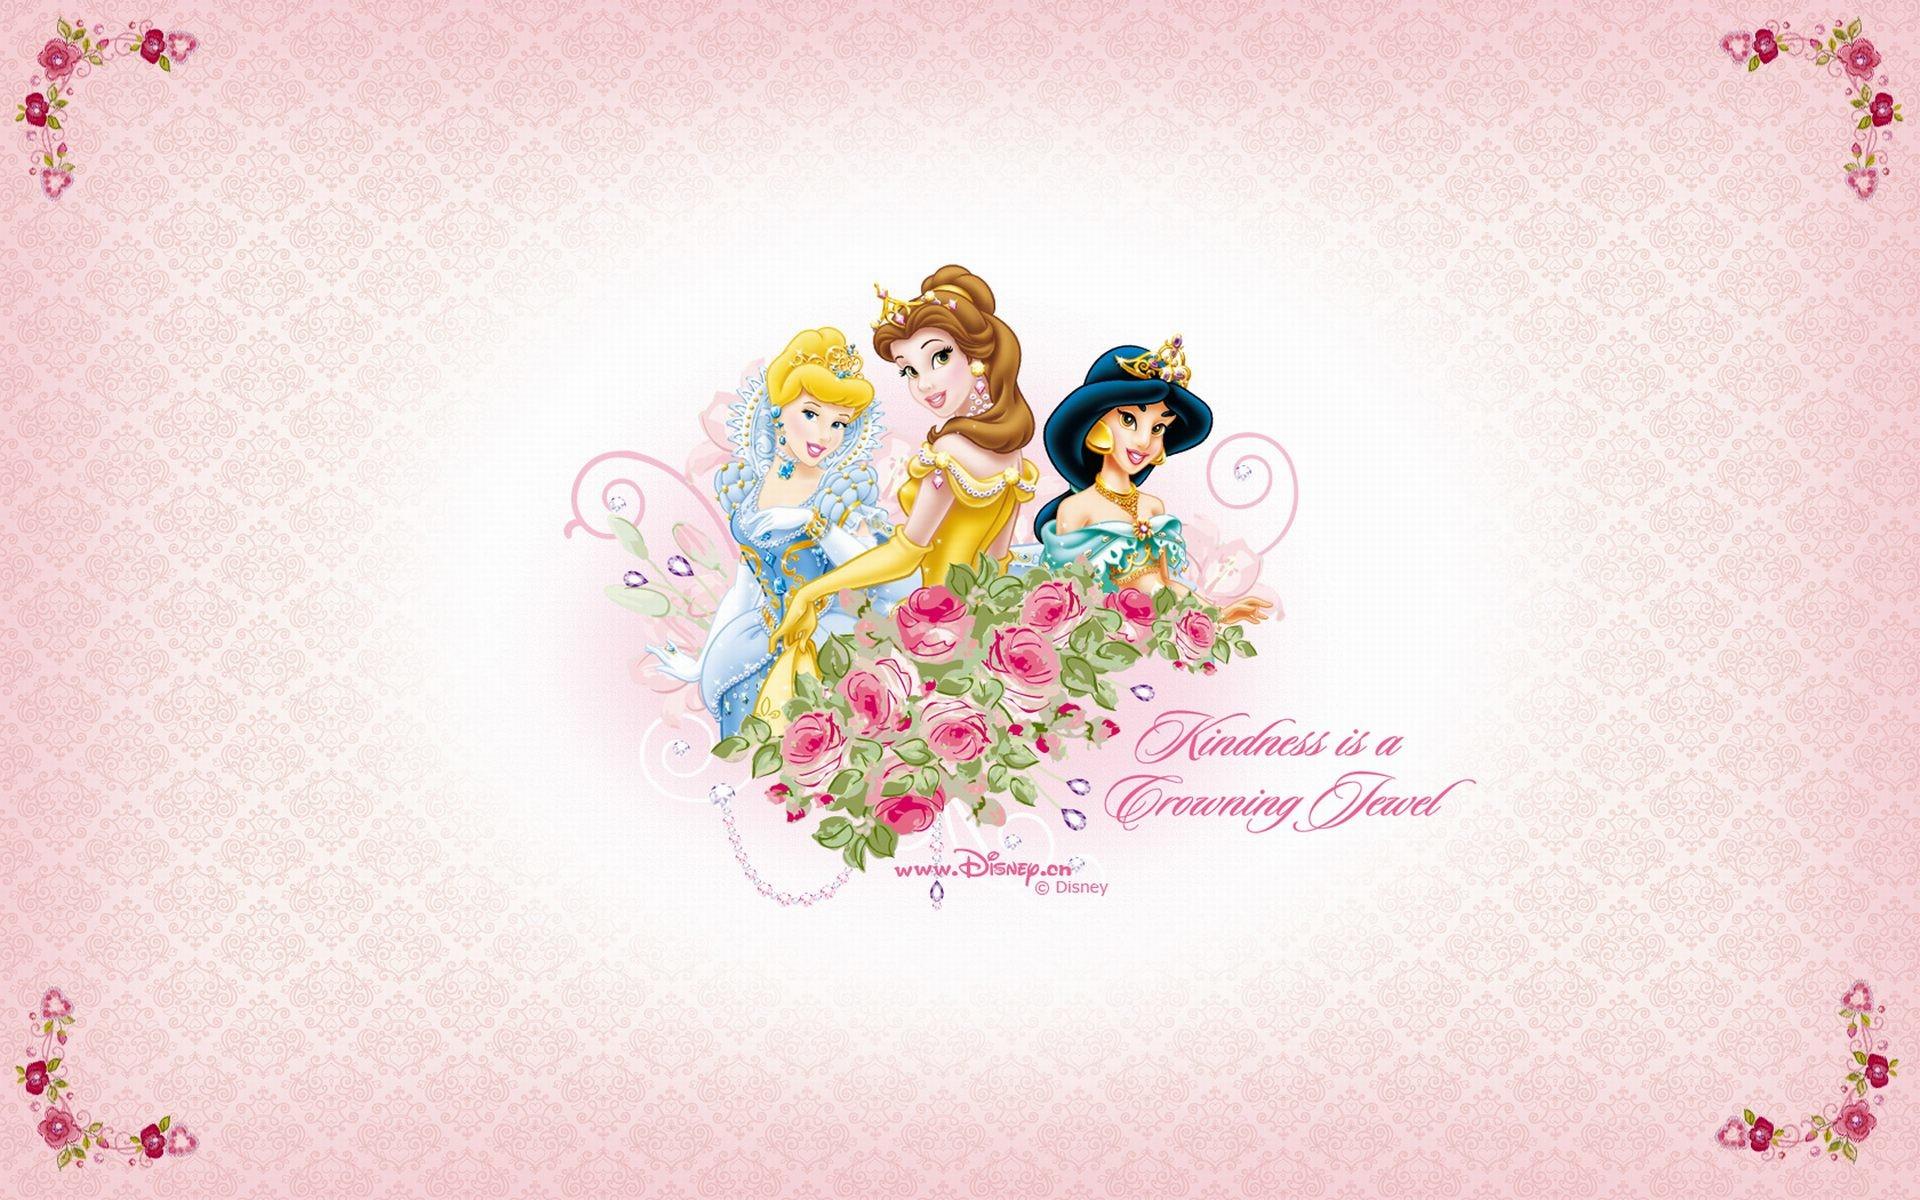 Disney Princes Fairy Tail Wallpaper